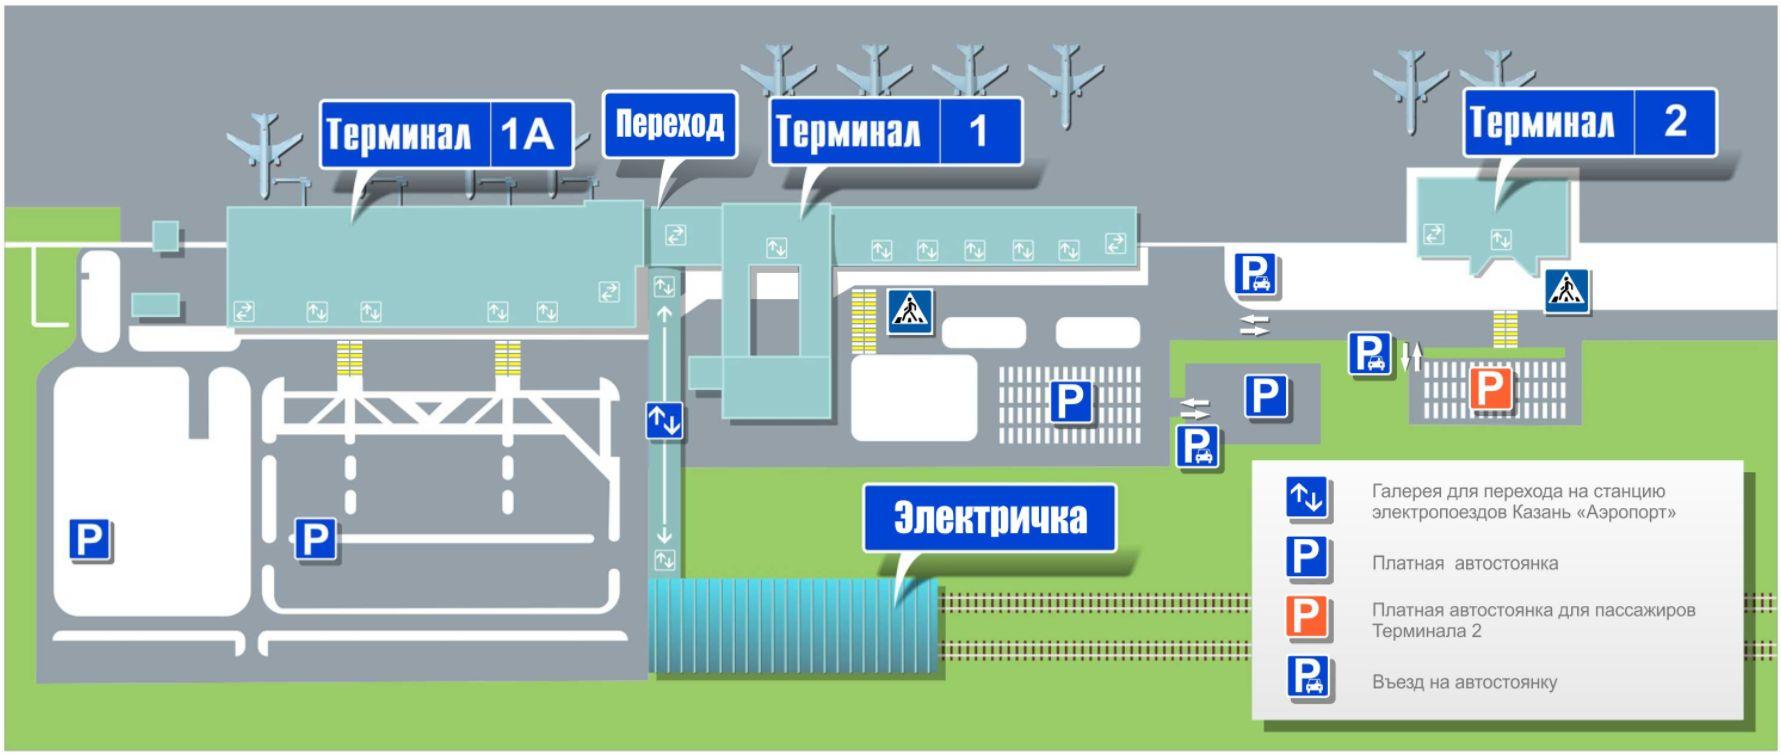 схема аэропорта Казань